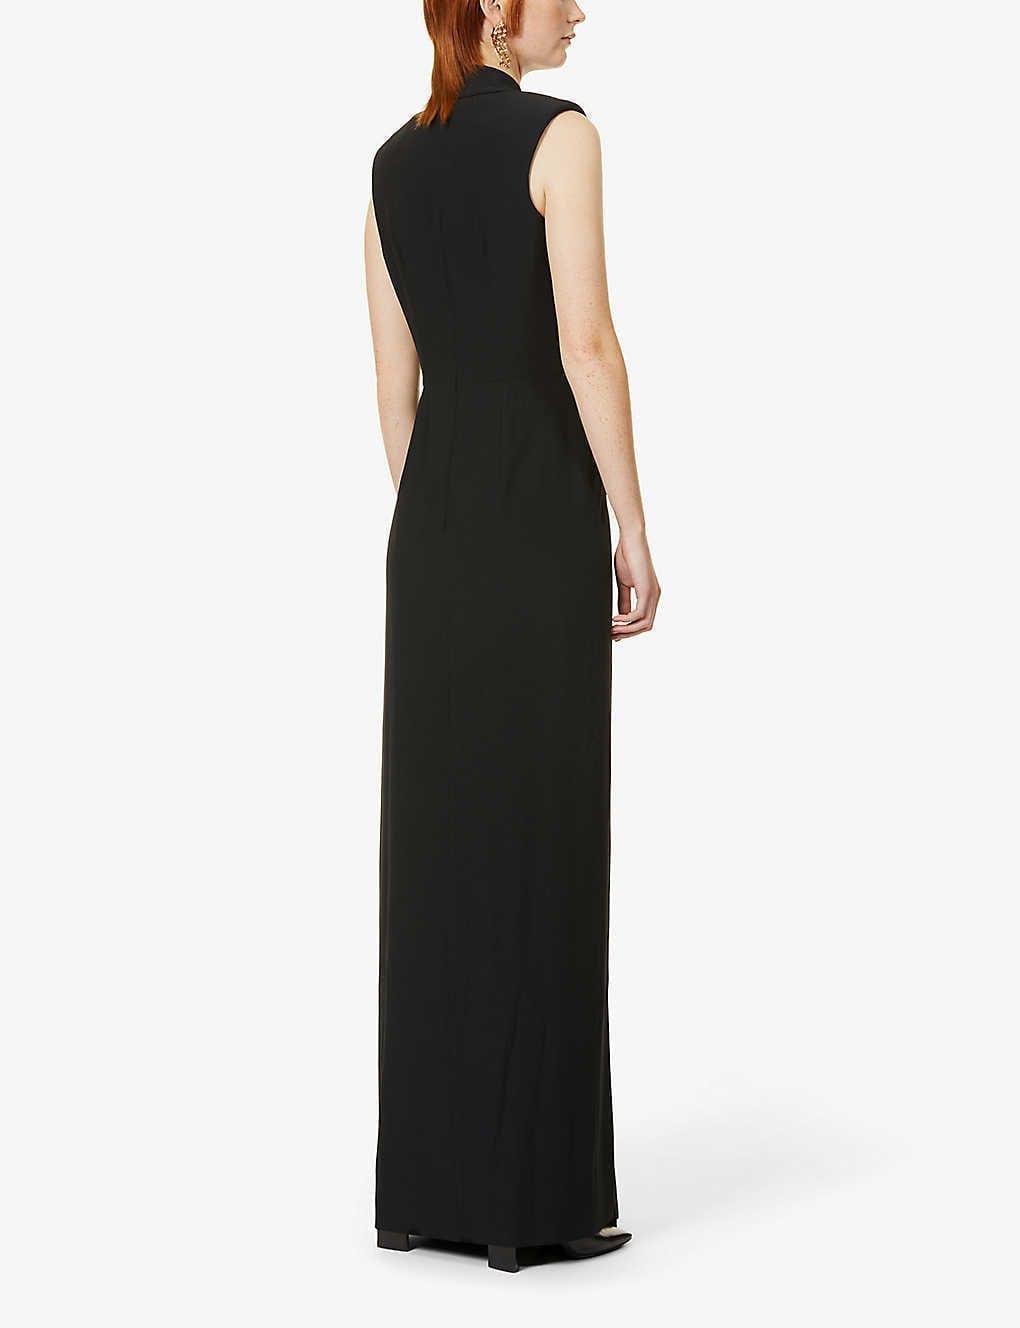 ALEXANDER MCQUEEN Sleeveless Wrap-Over Satin Gown